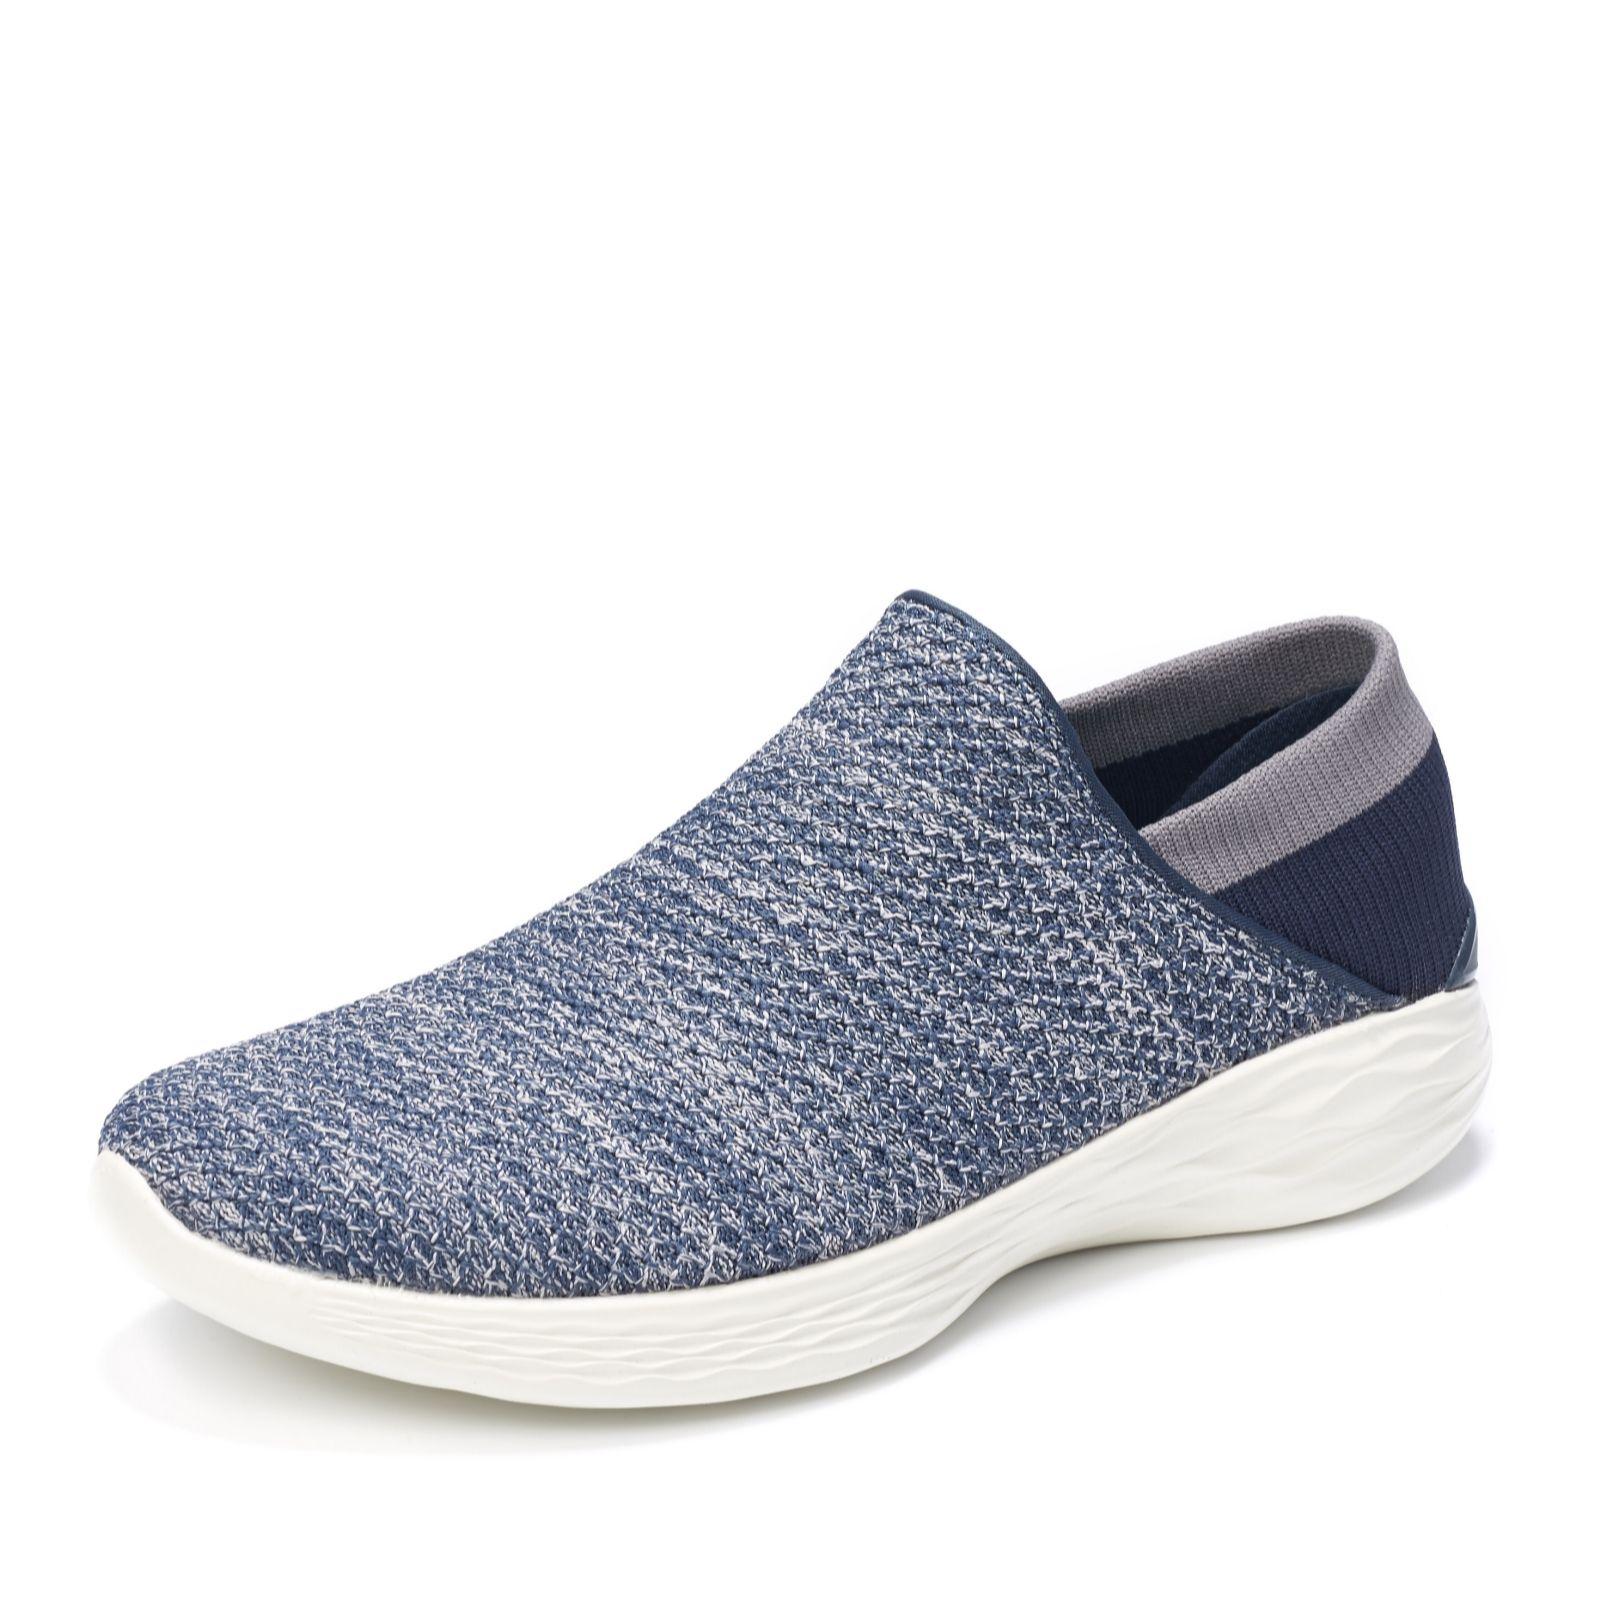 69d17c957230 Skechers YOU Gore Slip On Shoe - QVC UK